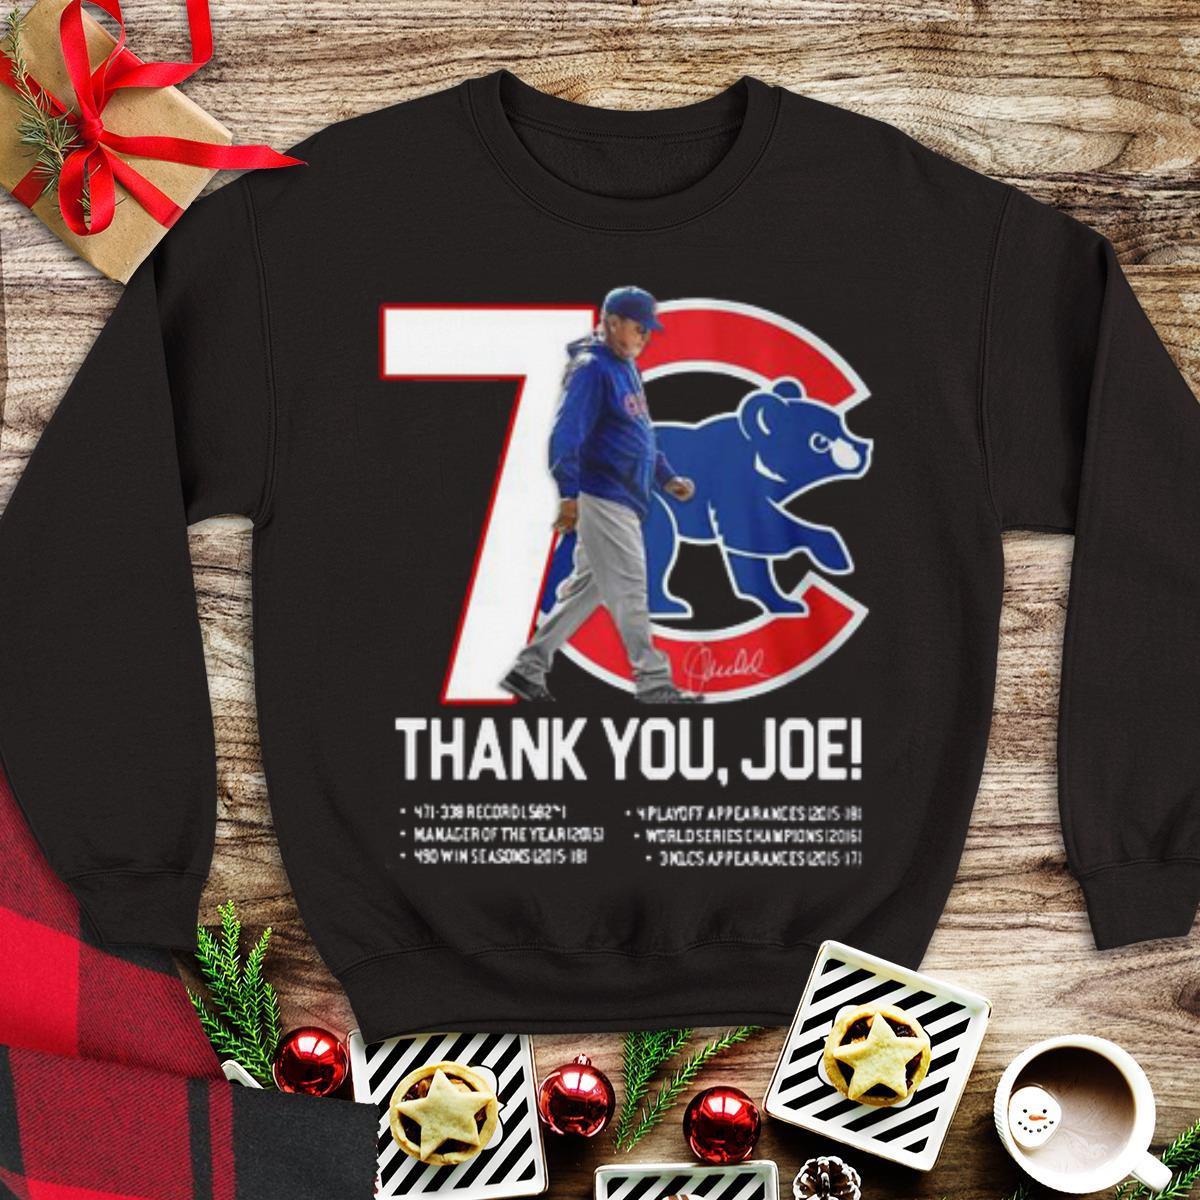 Awesome 7 Chicago Cubs Thank You Joe Maddon Rumors shirt